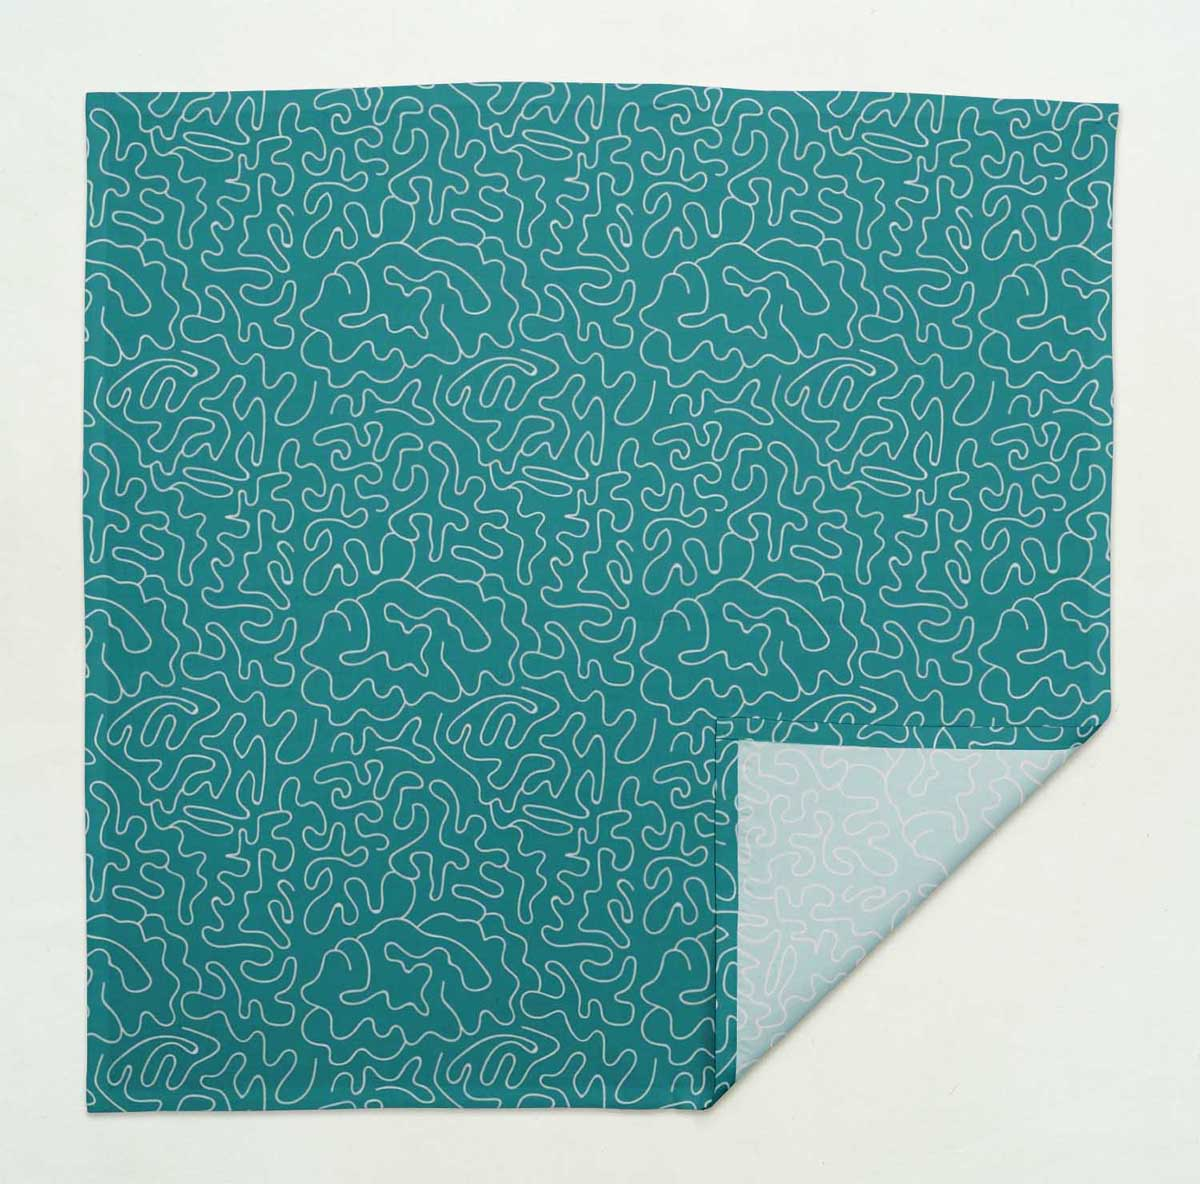 S4Sassy Text Parties Table Decor Linen Re-Usable Cloth Napkins Set-TX-528A